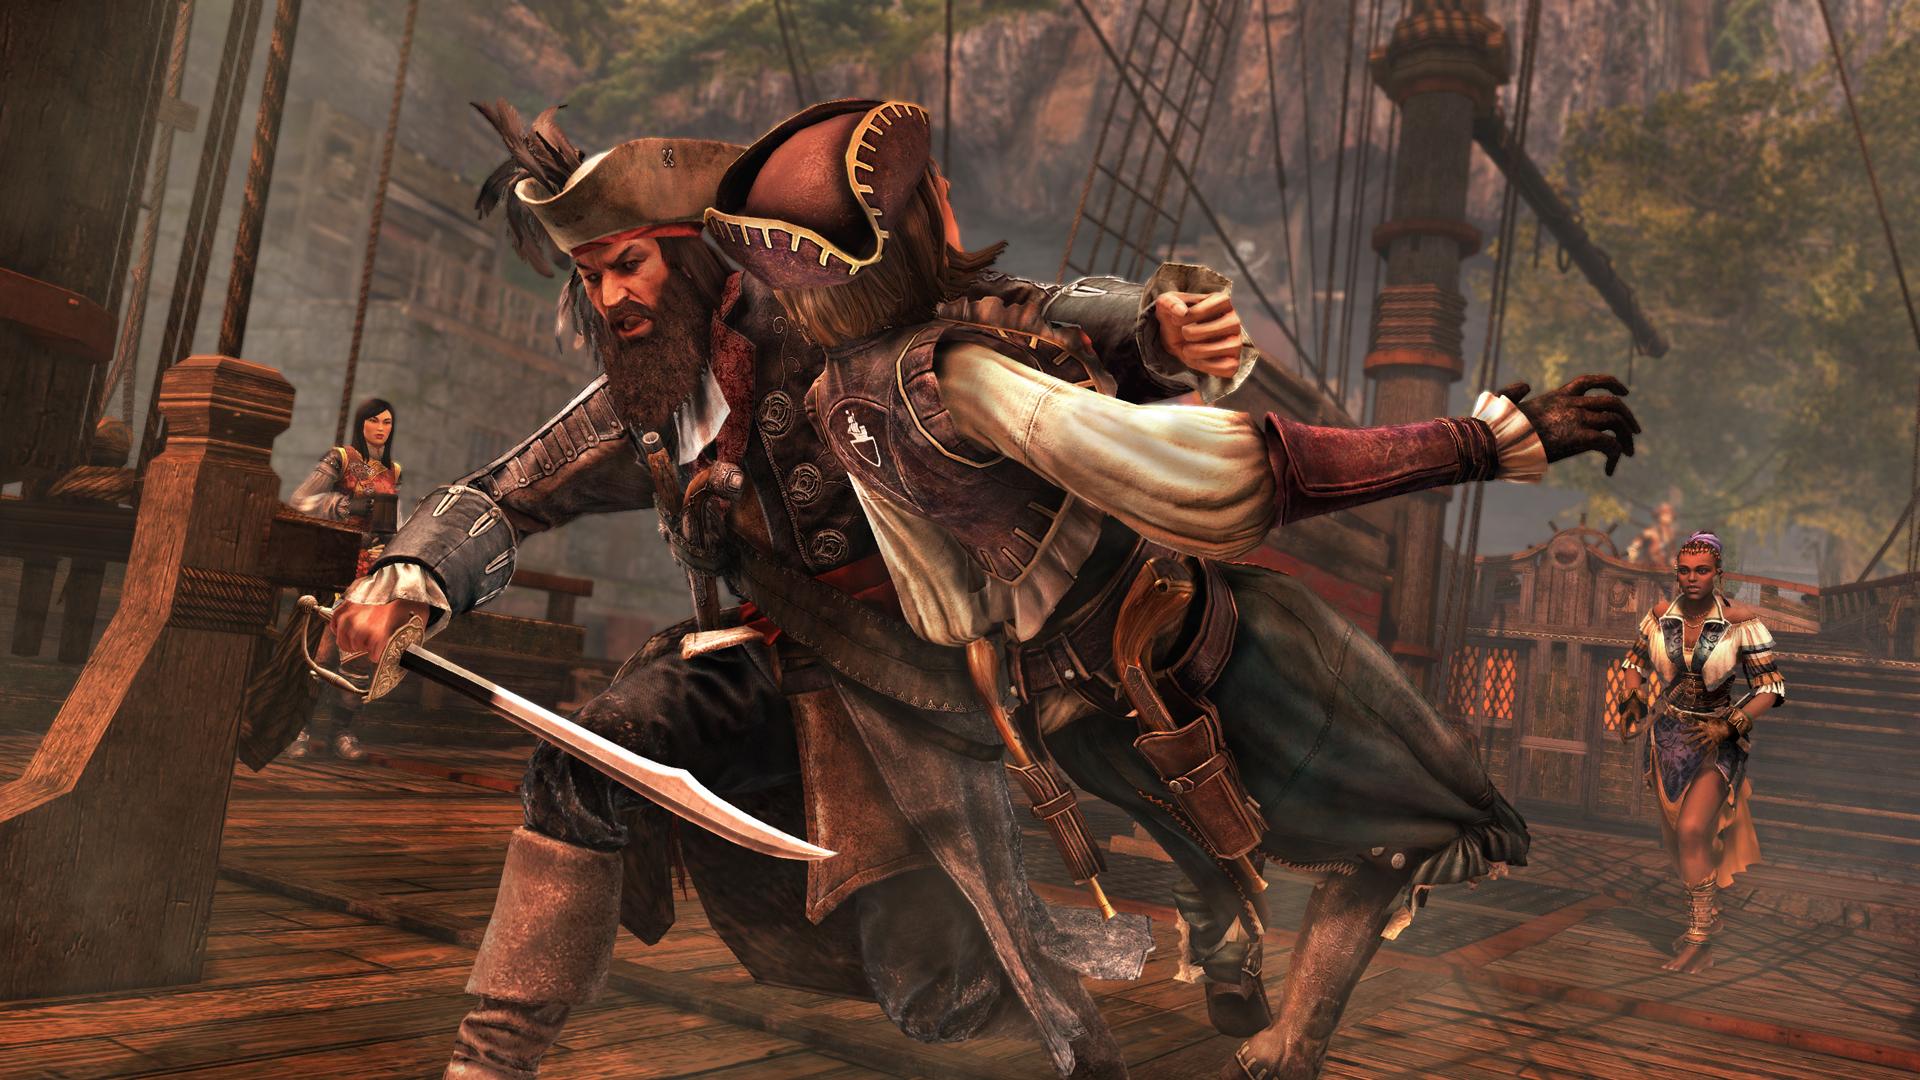 Assassin S Creed Iv Black Flag Blackbeard S Wrath Add On Content